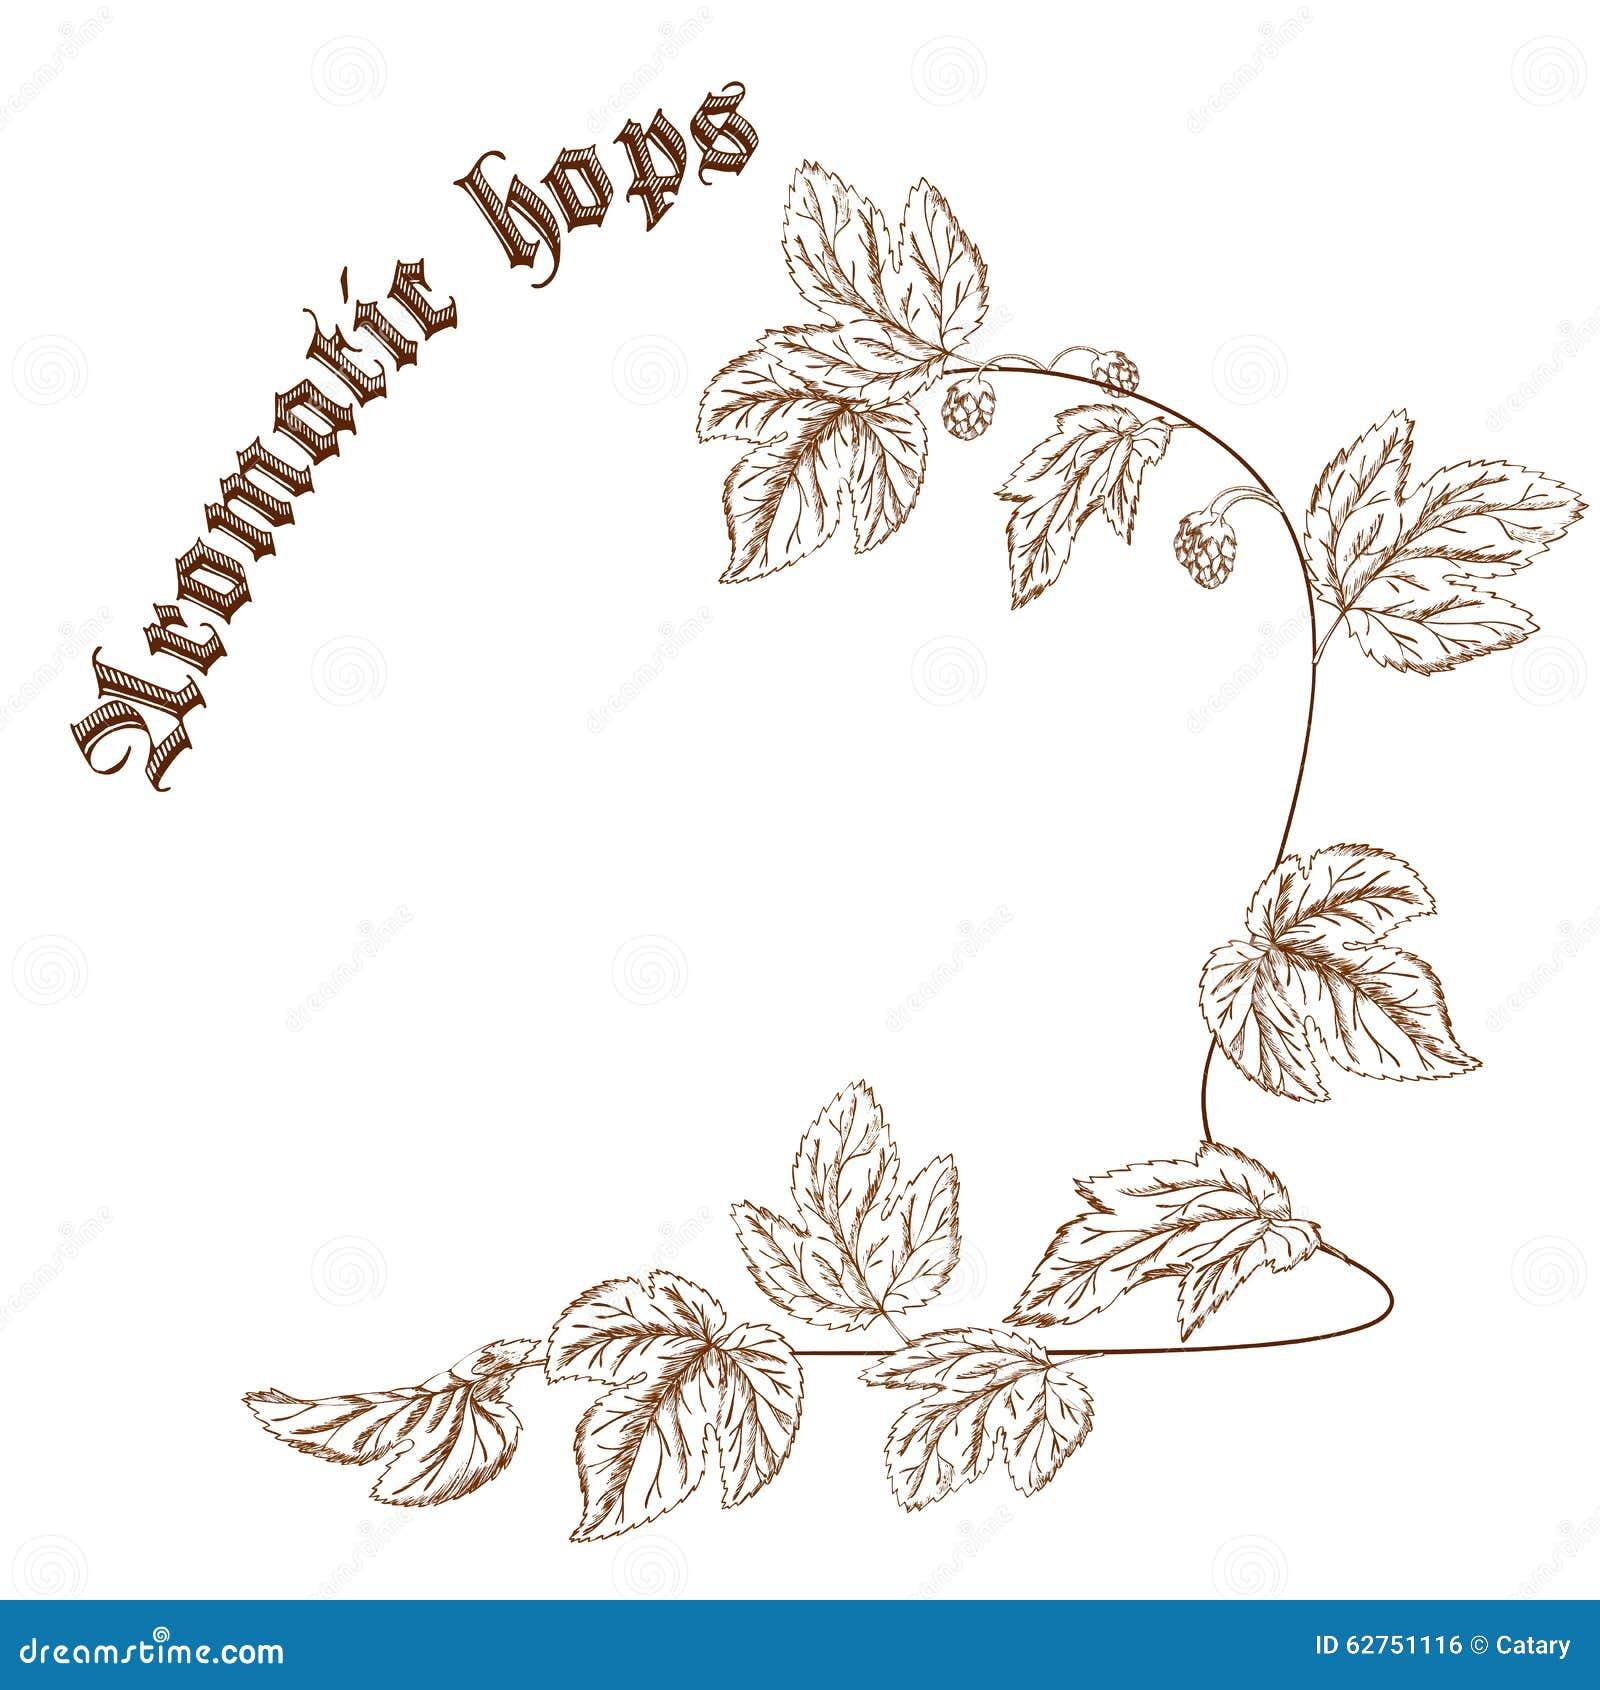 lombard logo vector 5Jh